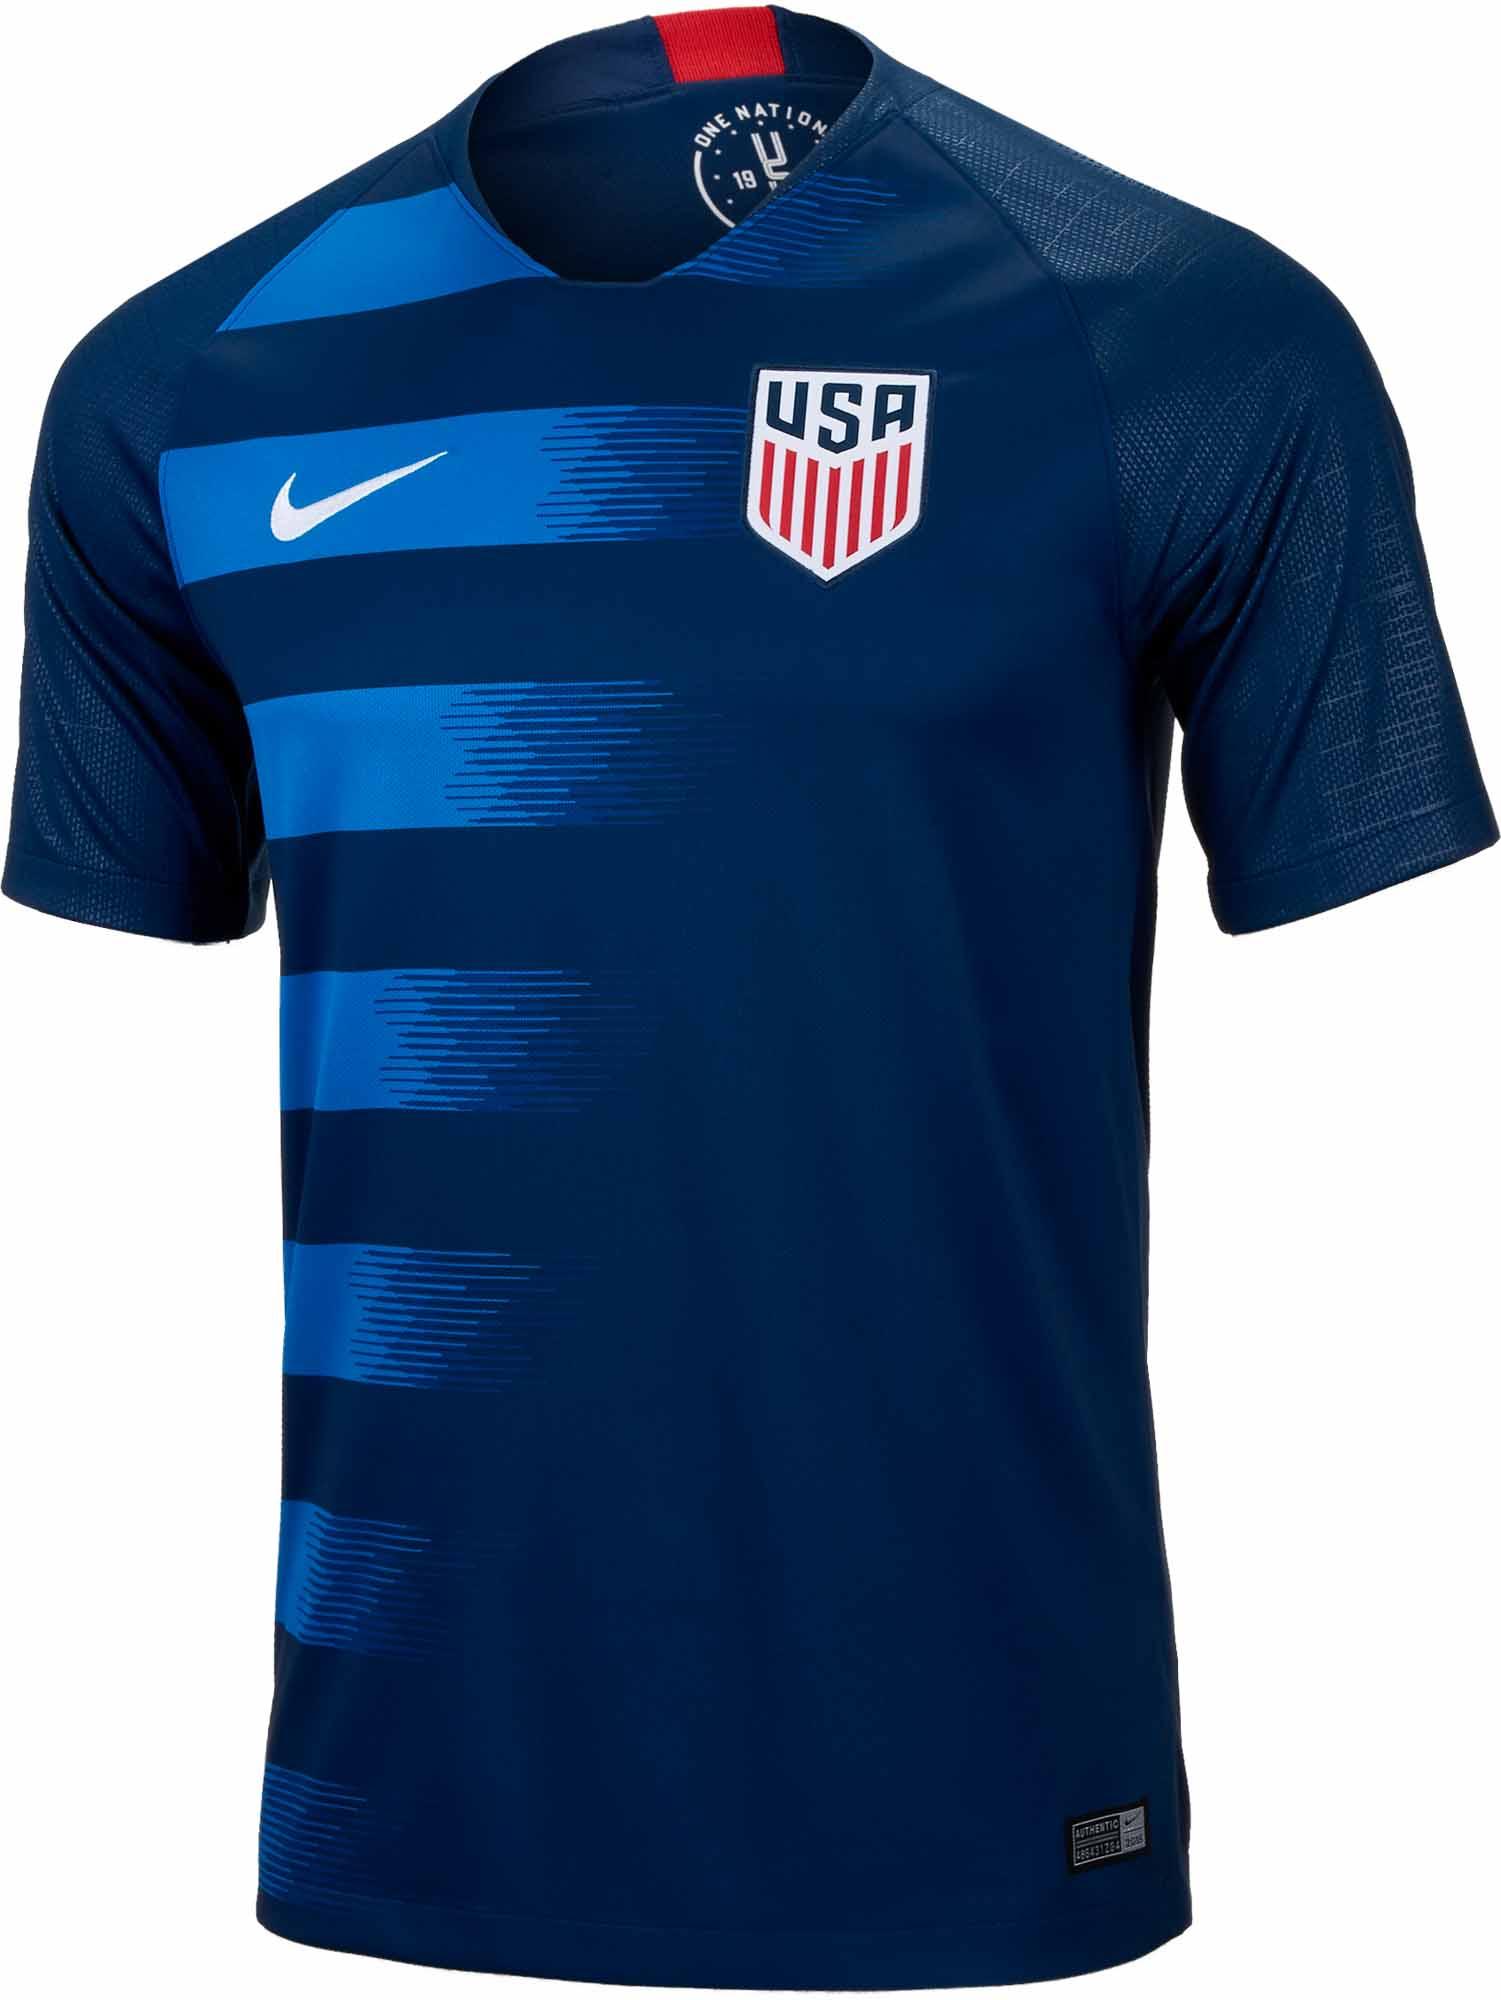 f836ac487 Nike USA Away Jersey 2018-19 - from SoccerPro.com